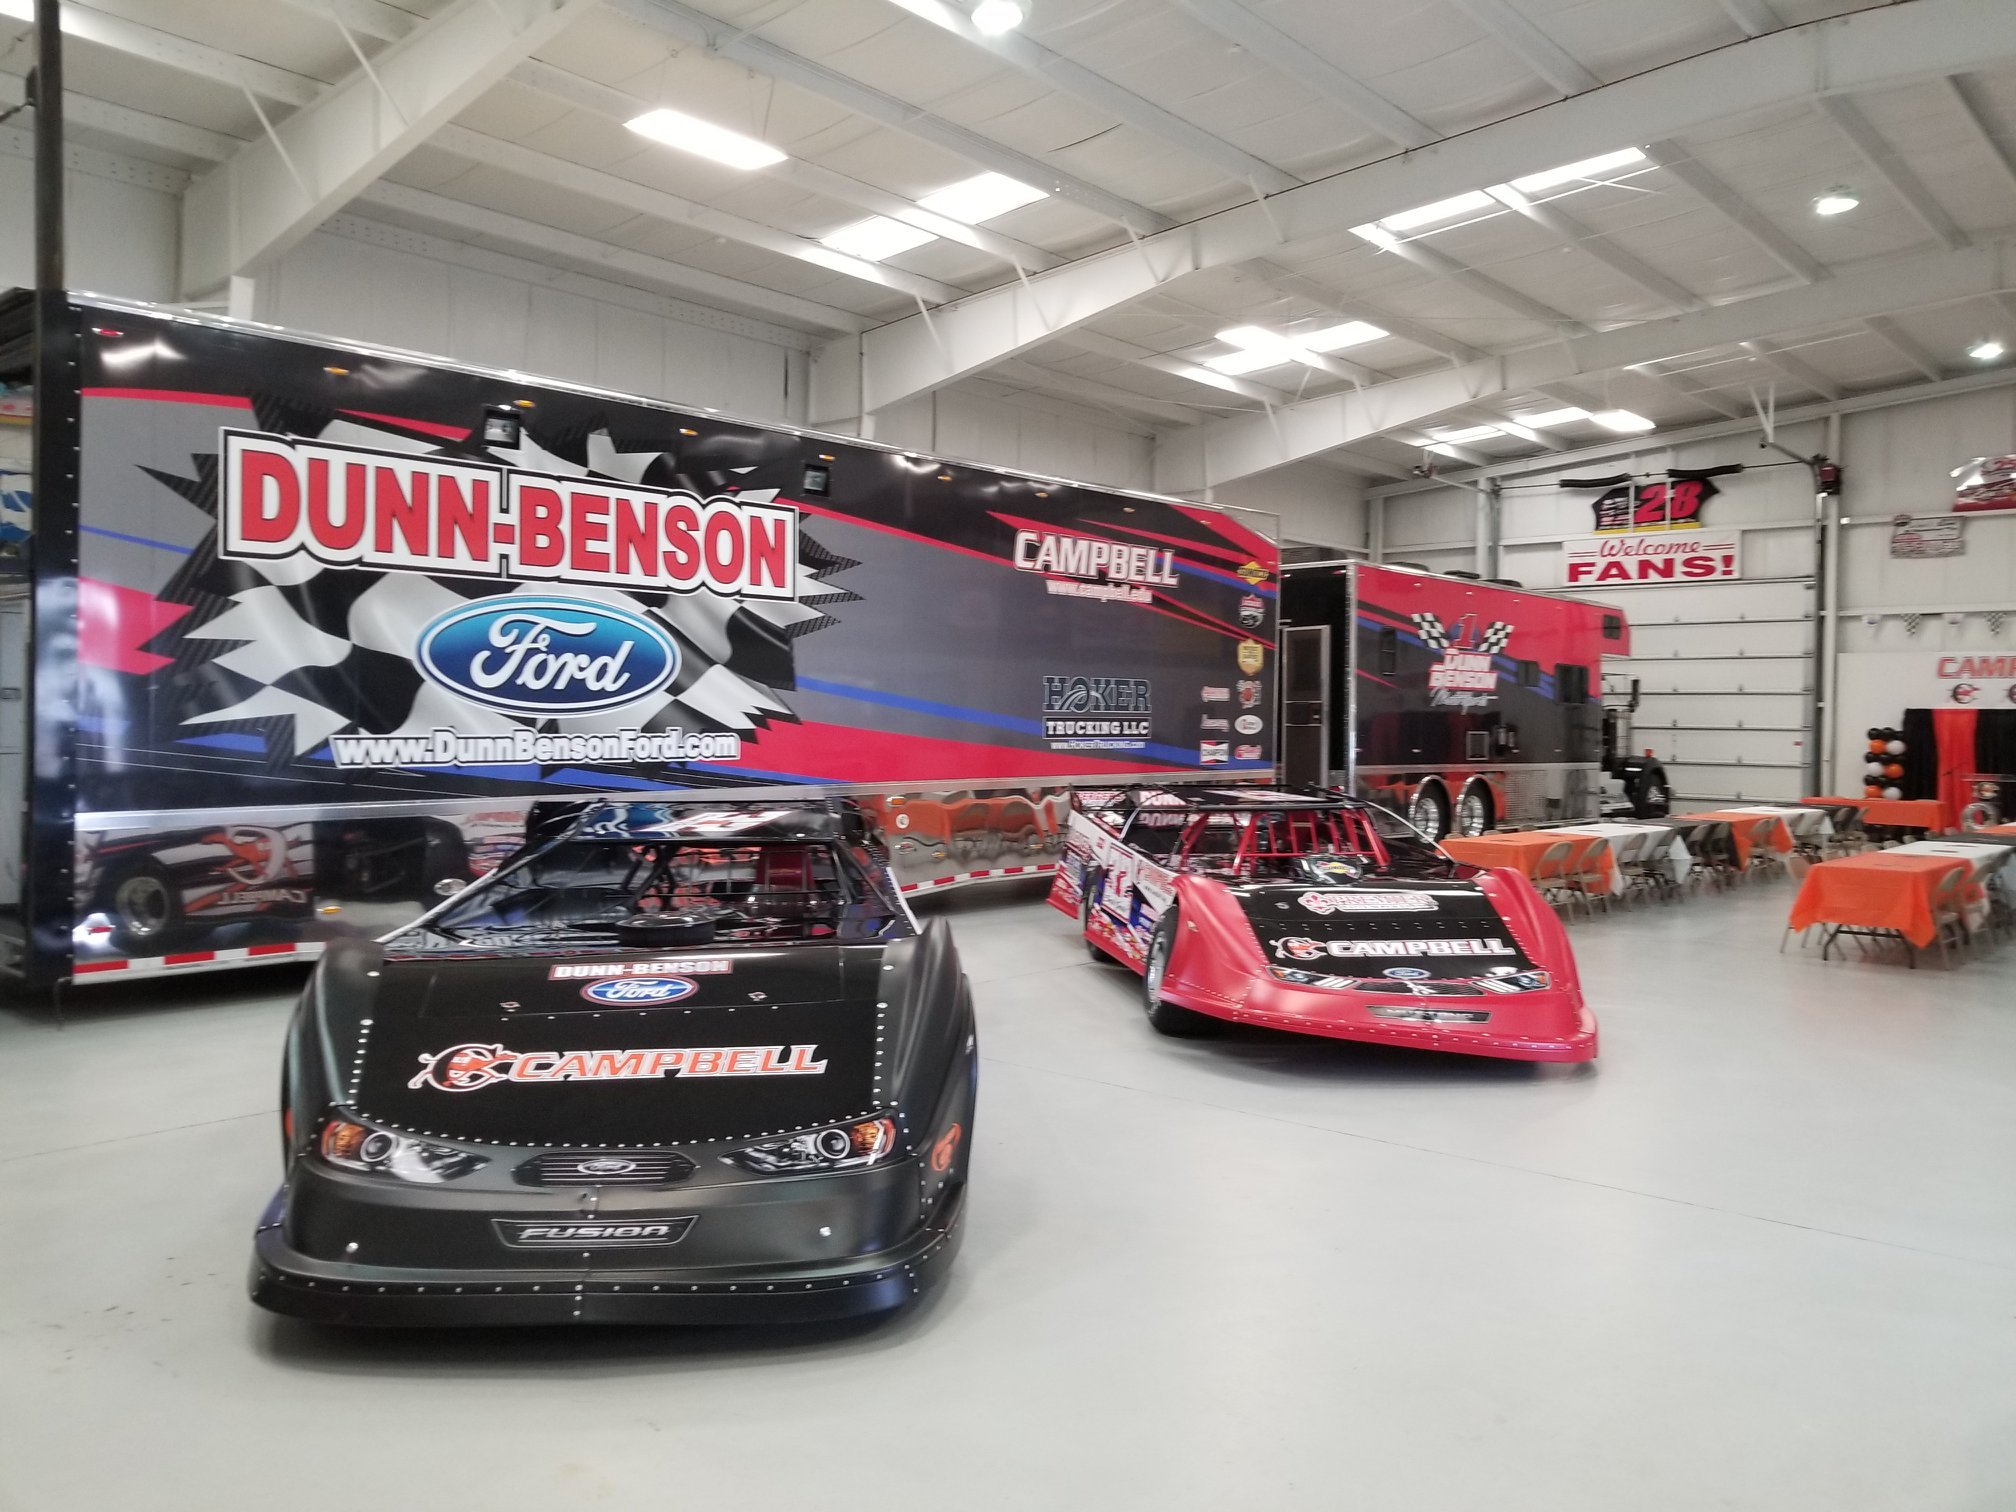 Pierce Race Cars: Bobby Pierce, Campbell University Wrap Makes Debut At Dunn